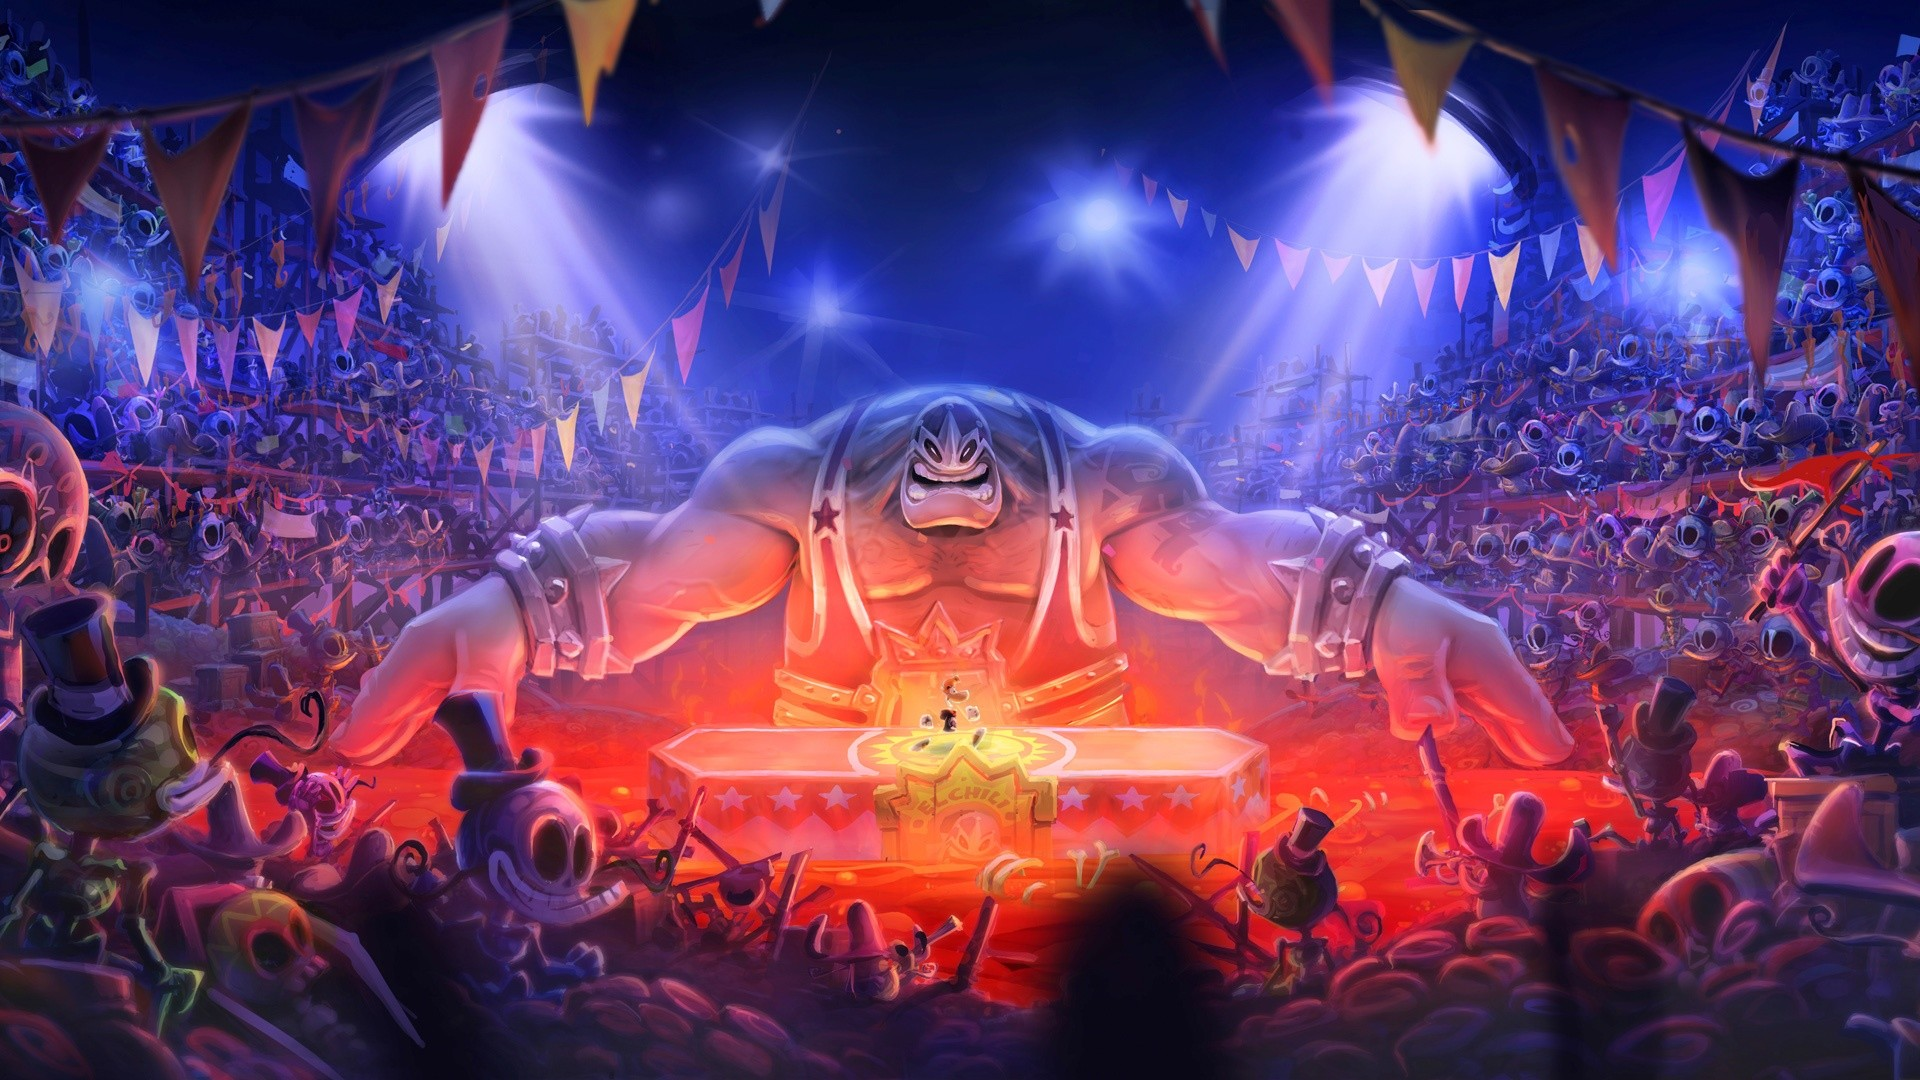 Rayman Legends Game Art Wallpapers